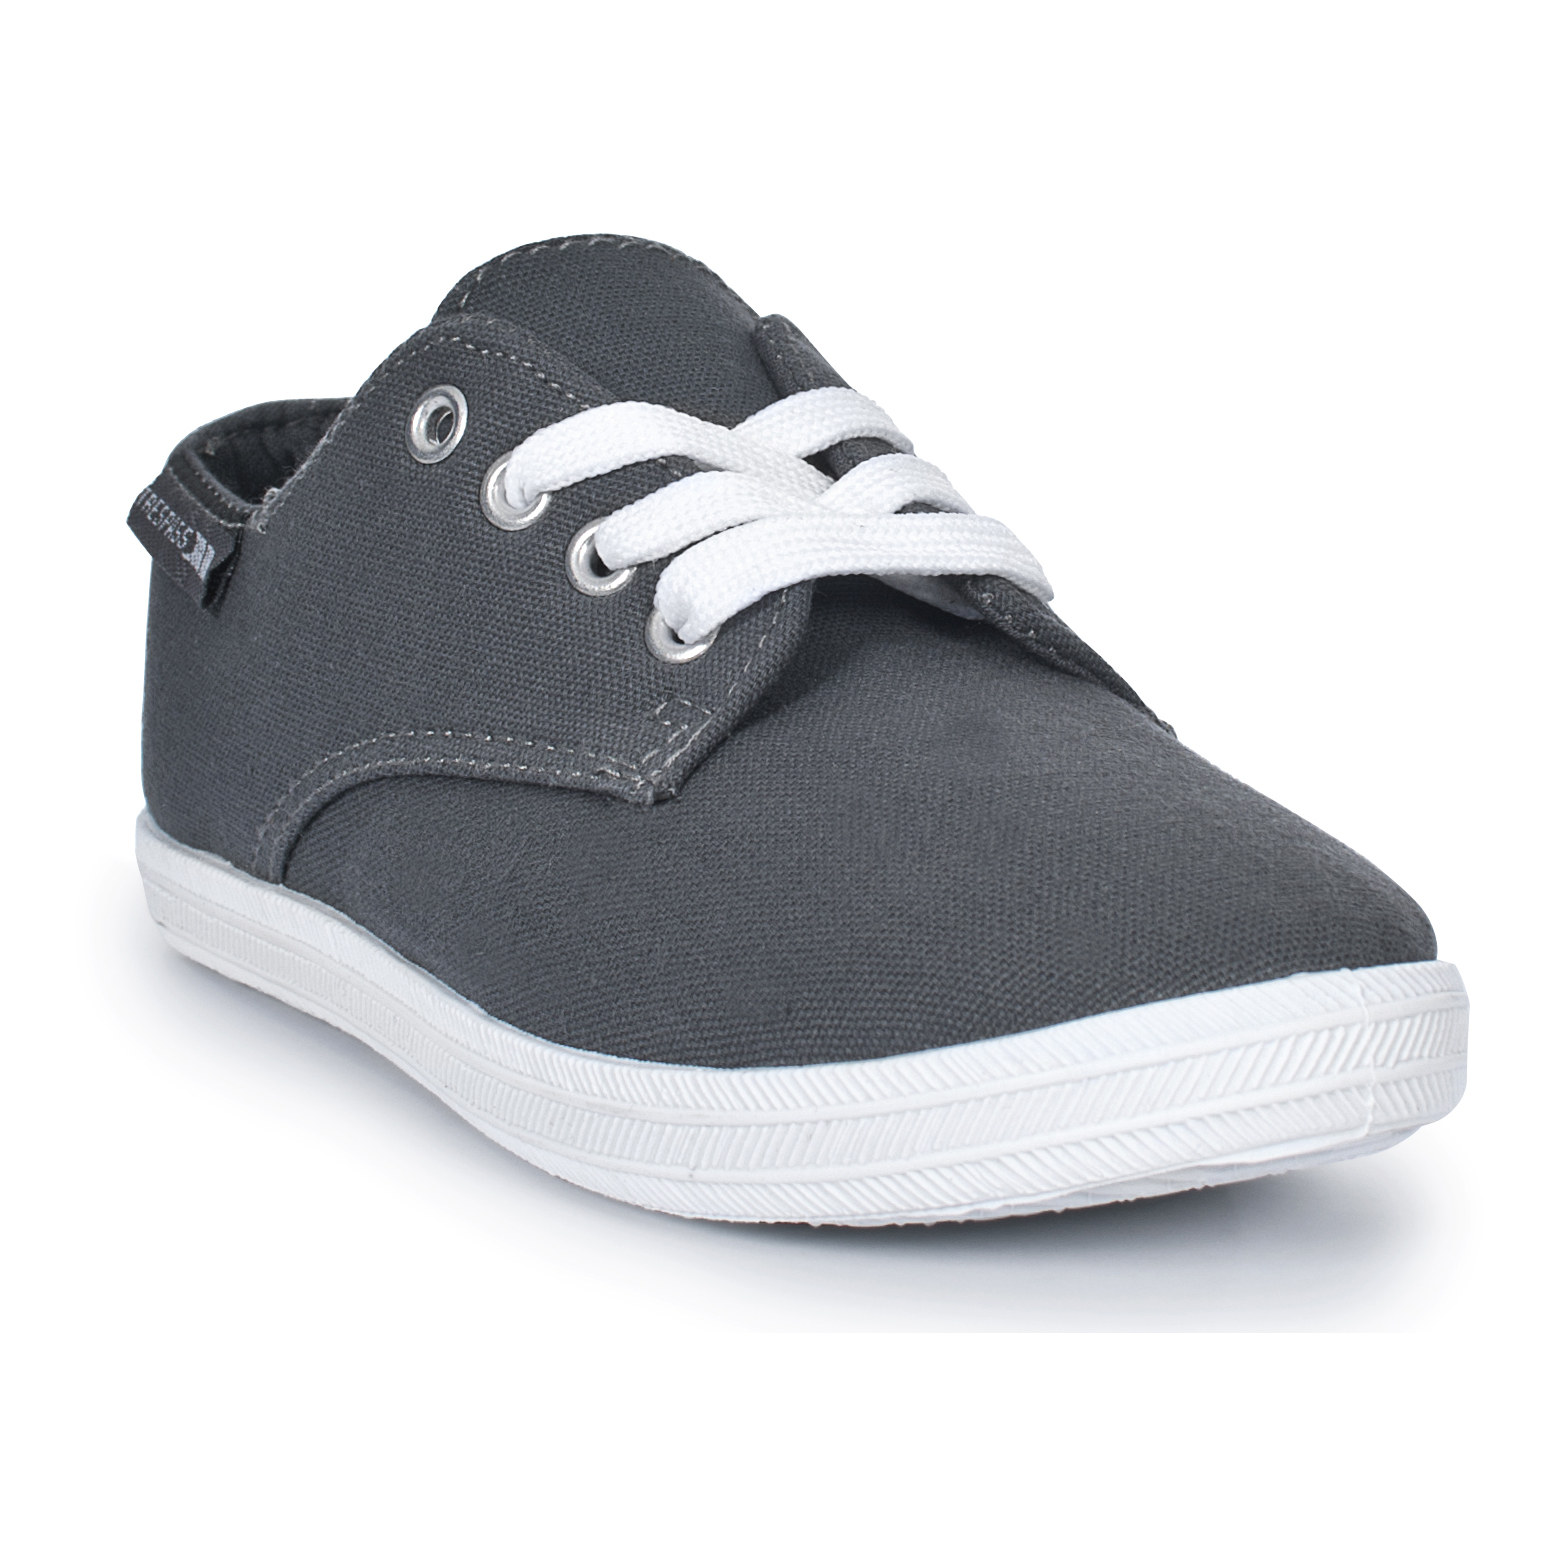 Trespass parachoques Chicos Lona Zapatos Zapatillas